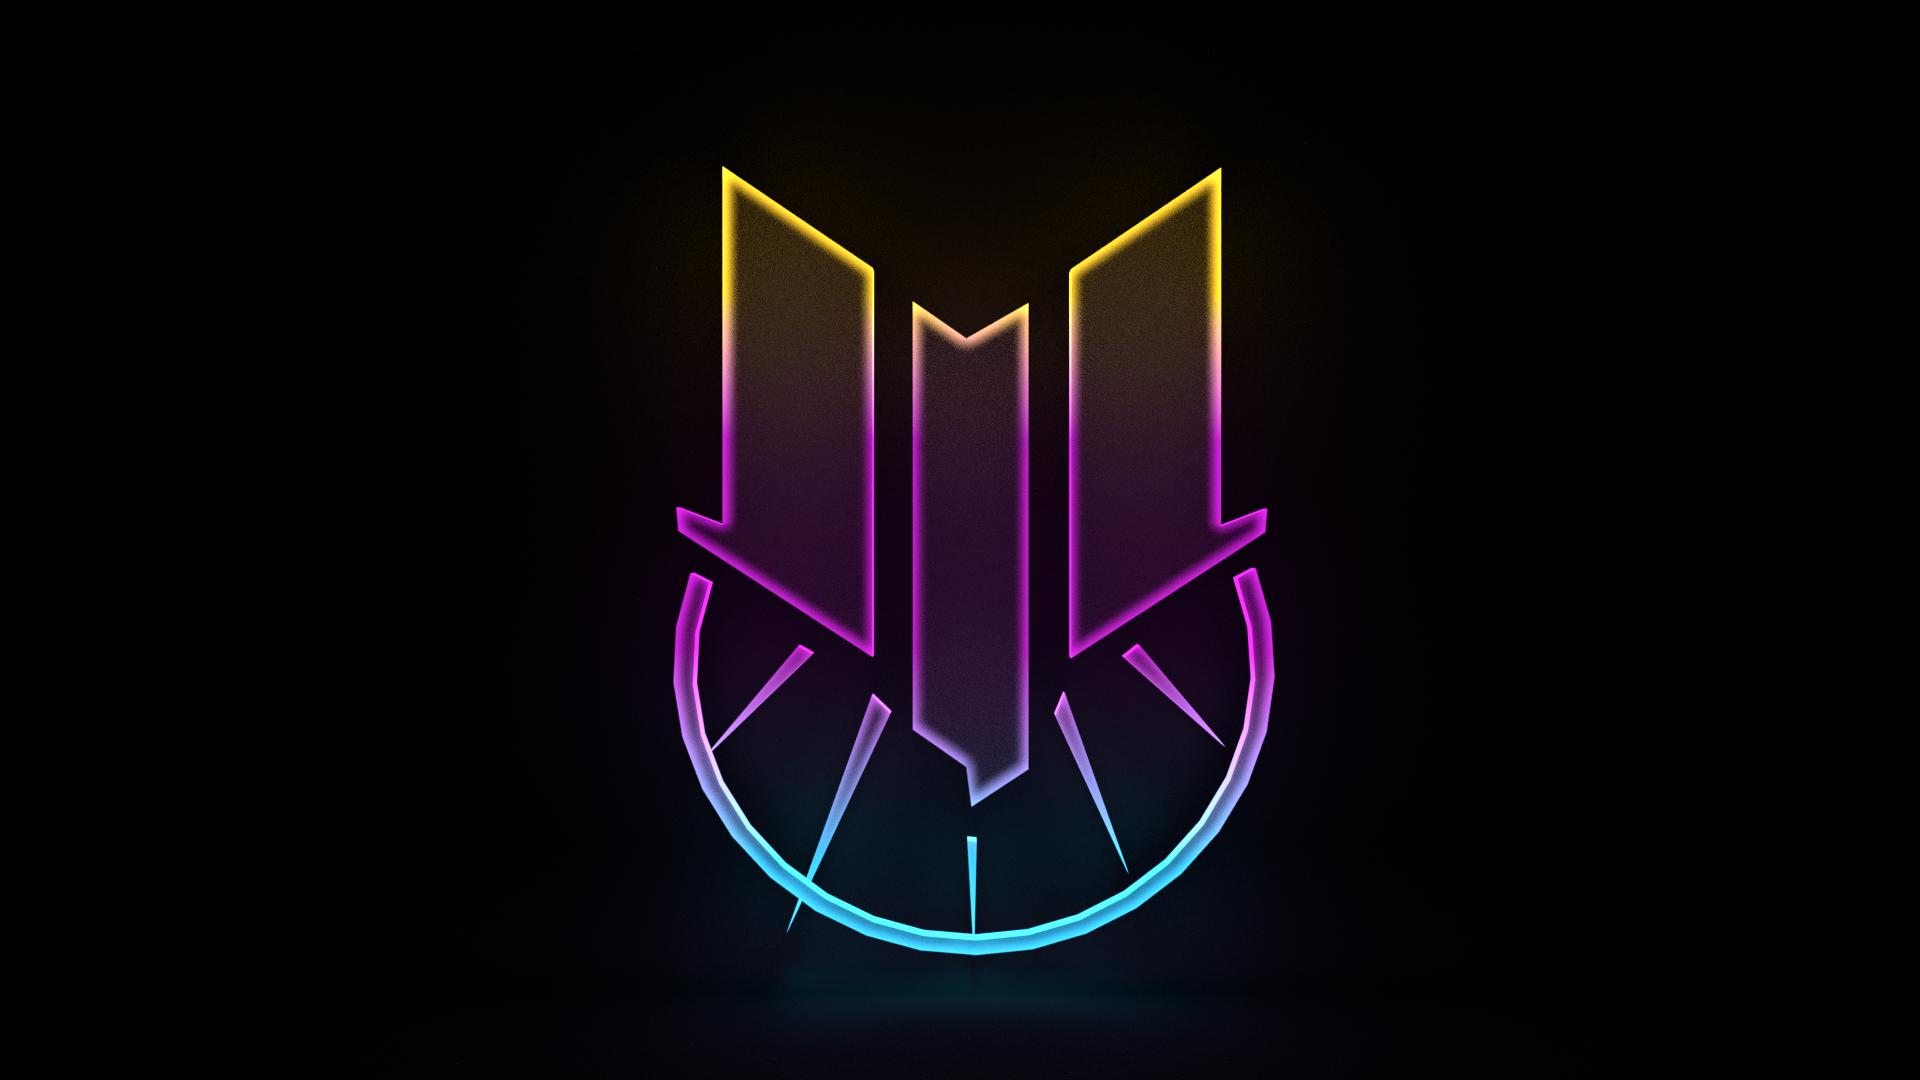 Solaris United logo made in Blender : Warframe.